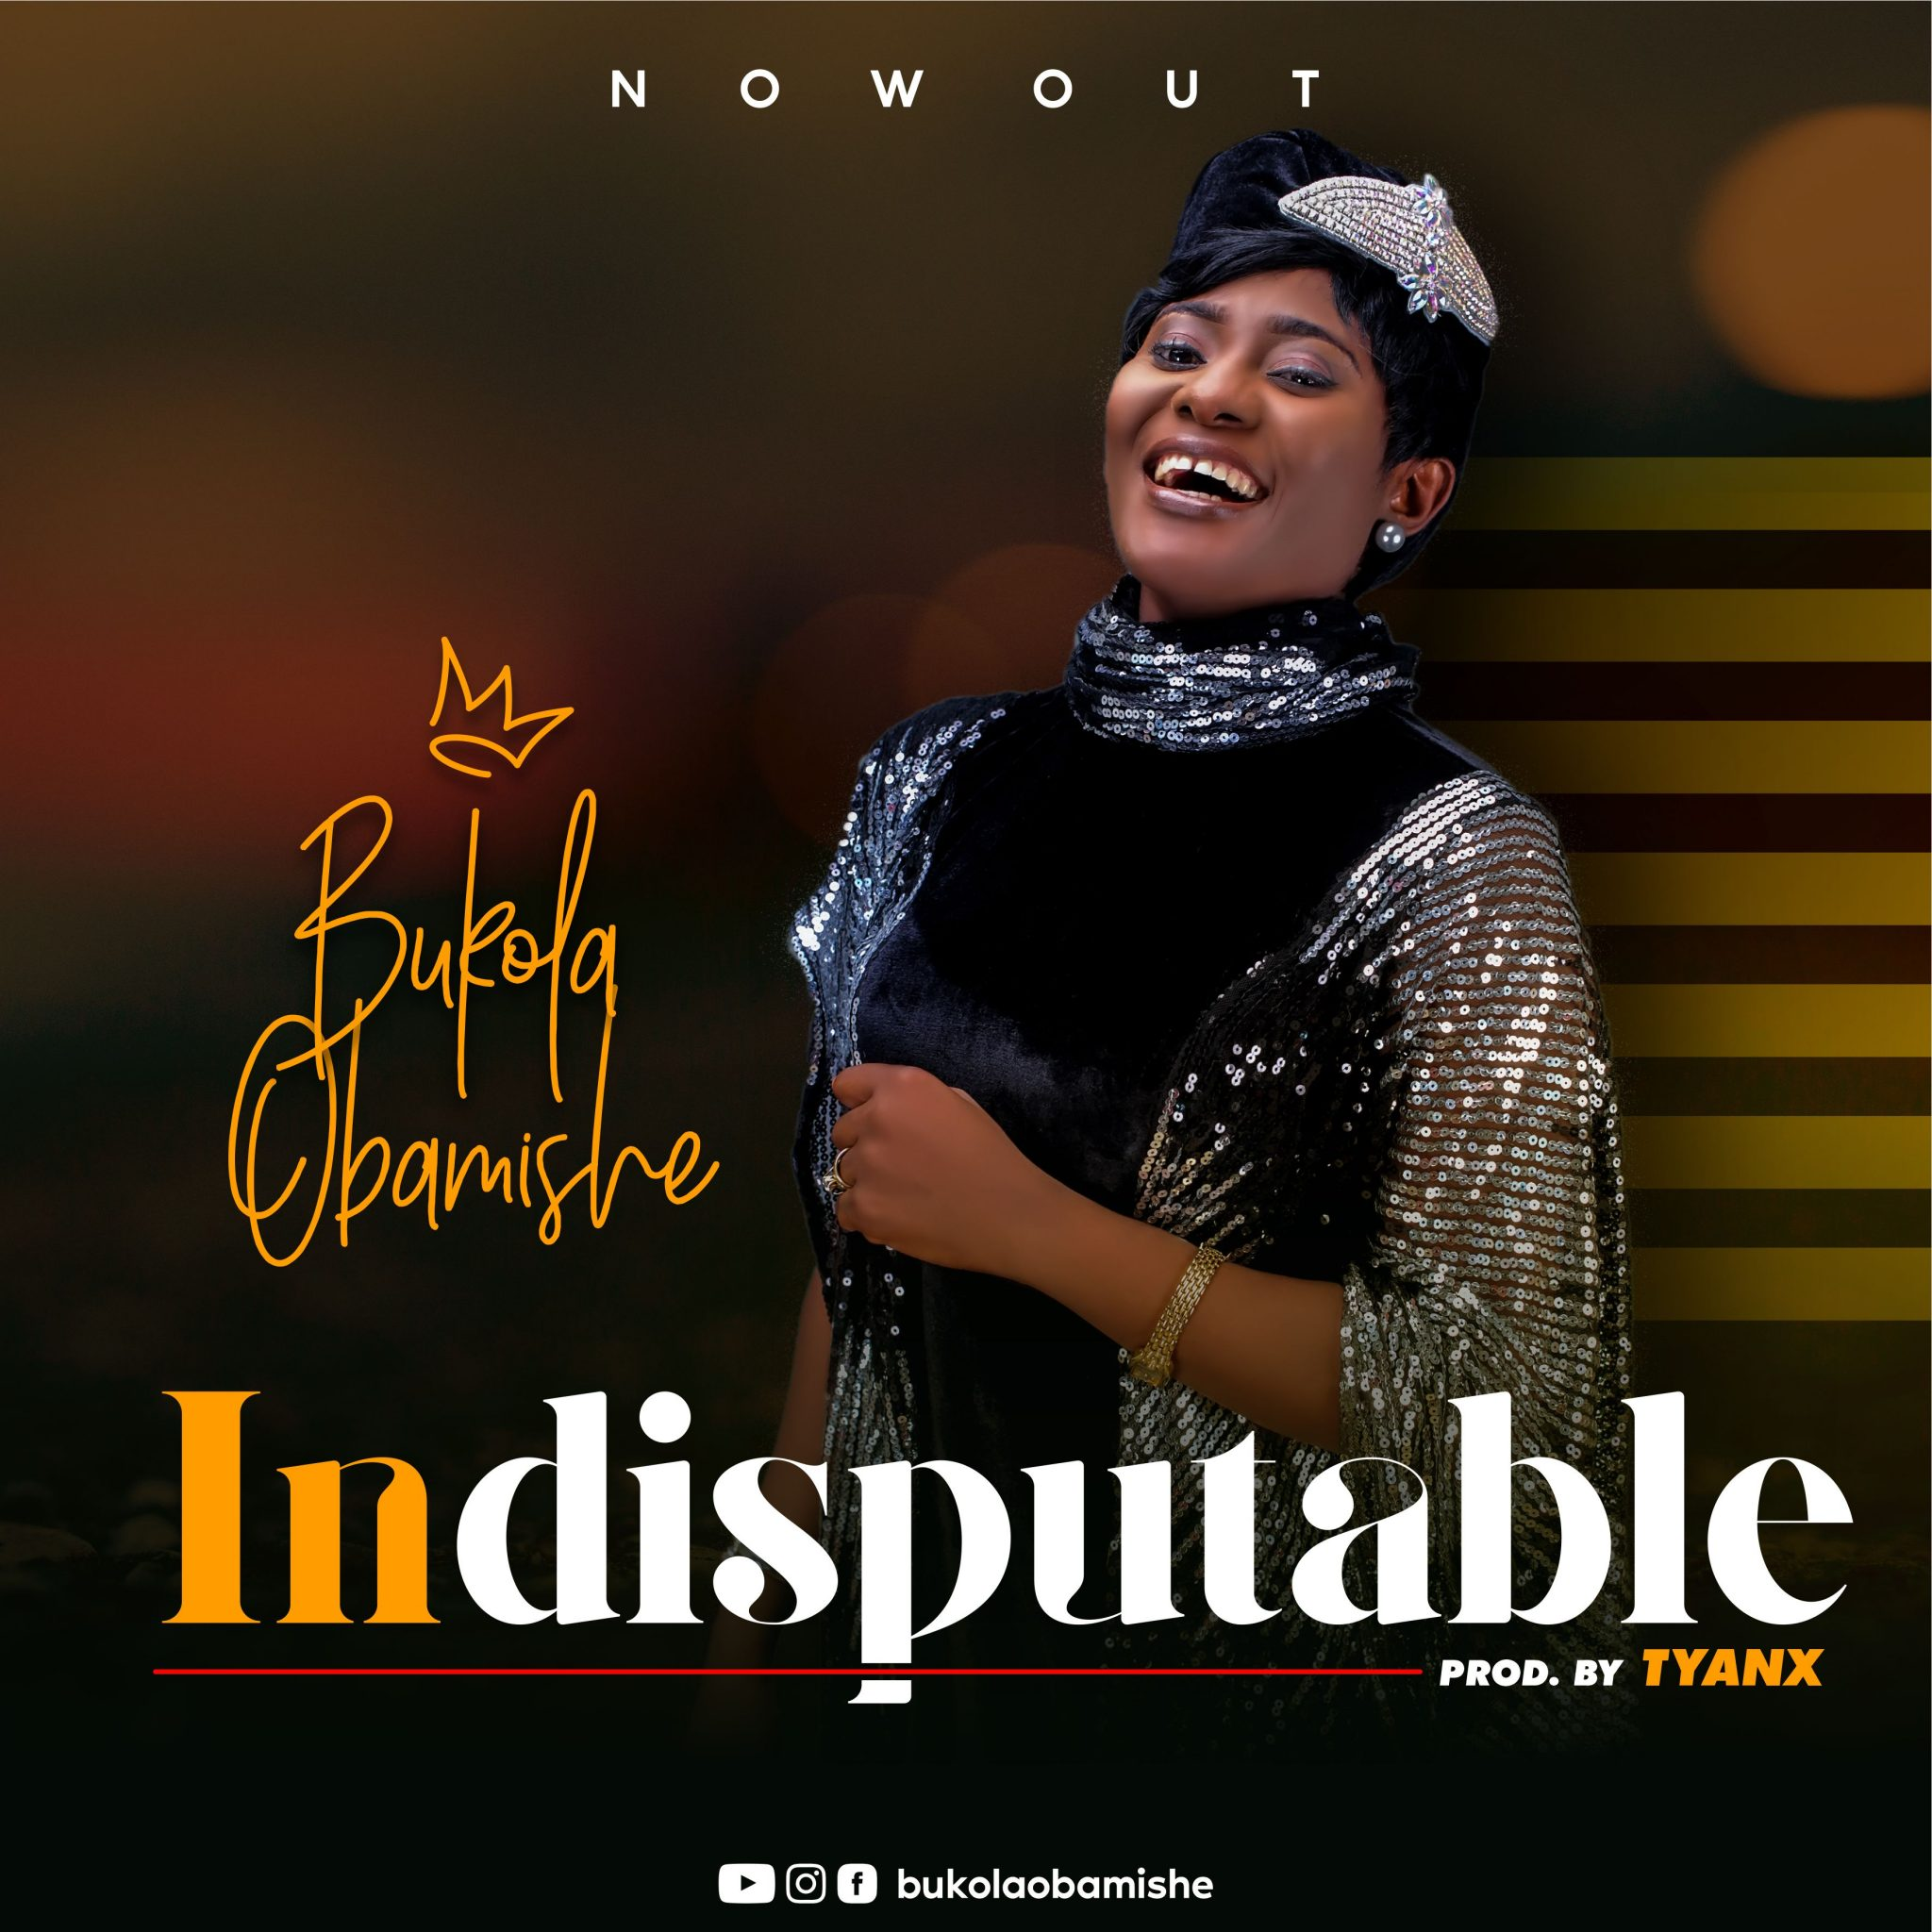 Download MP3 Bukola Obamishe - Indisputable